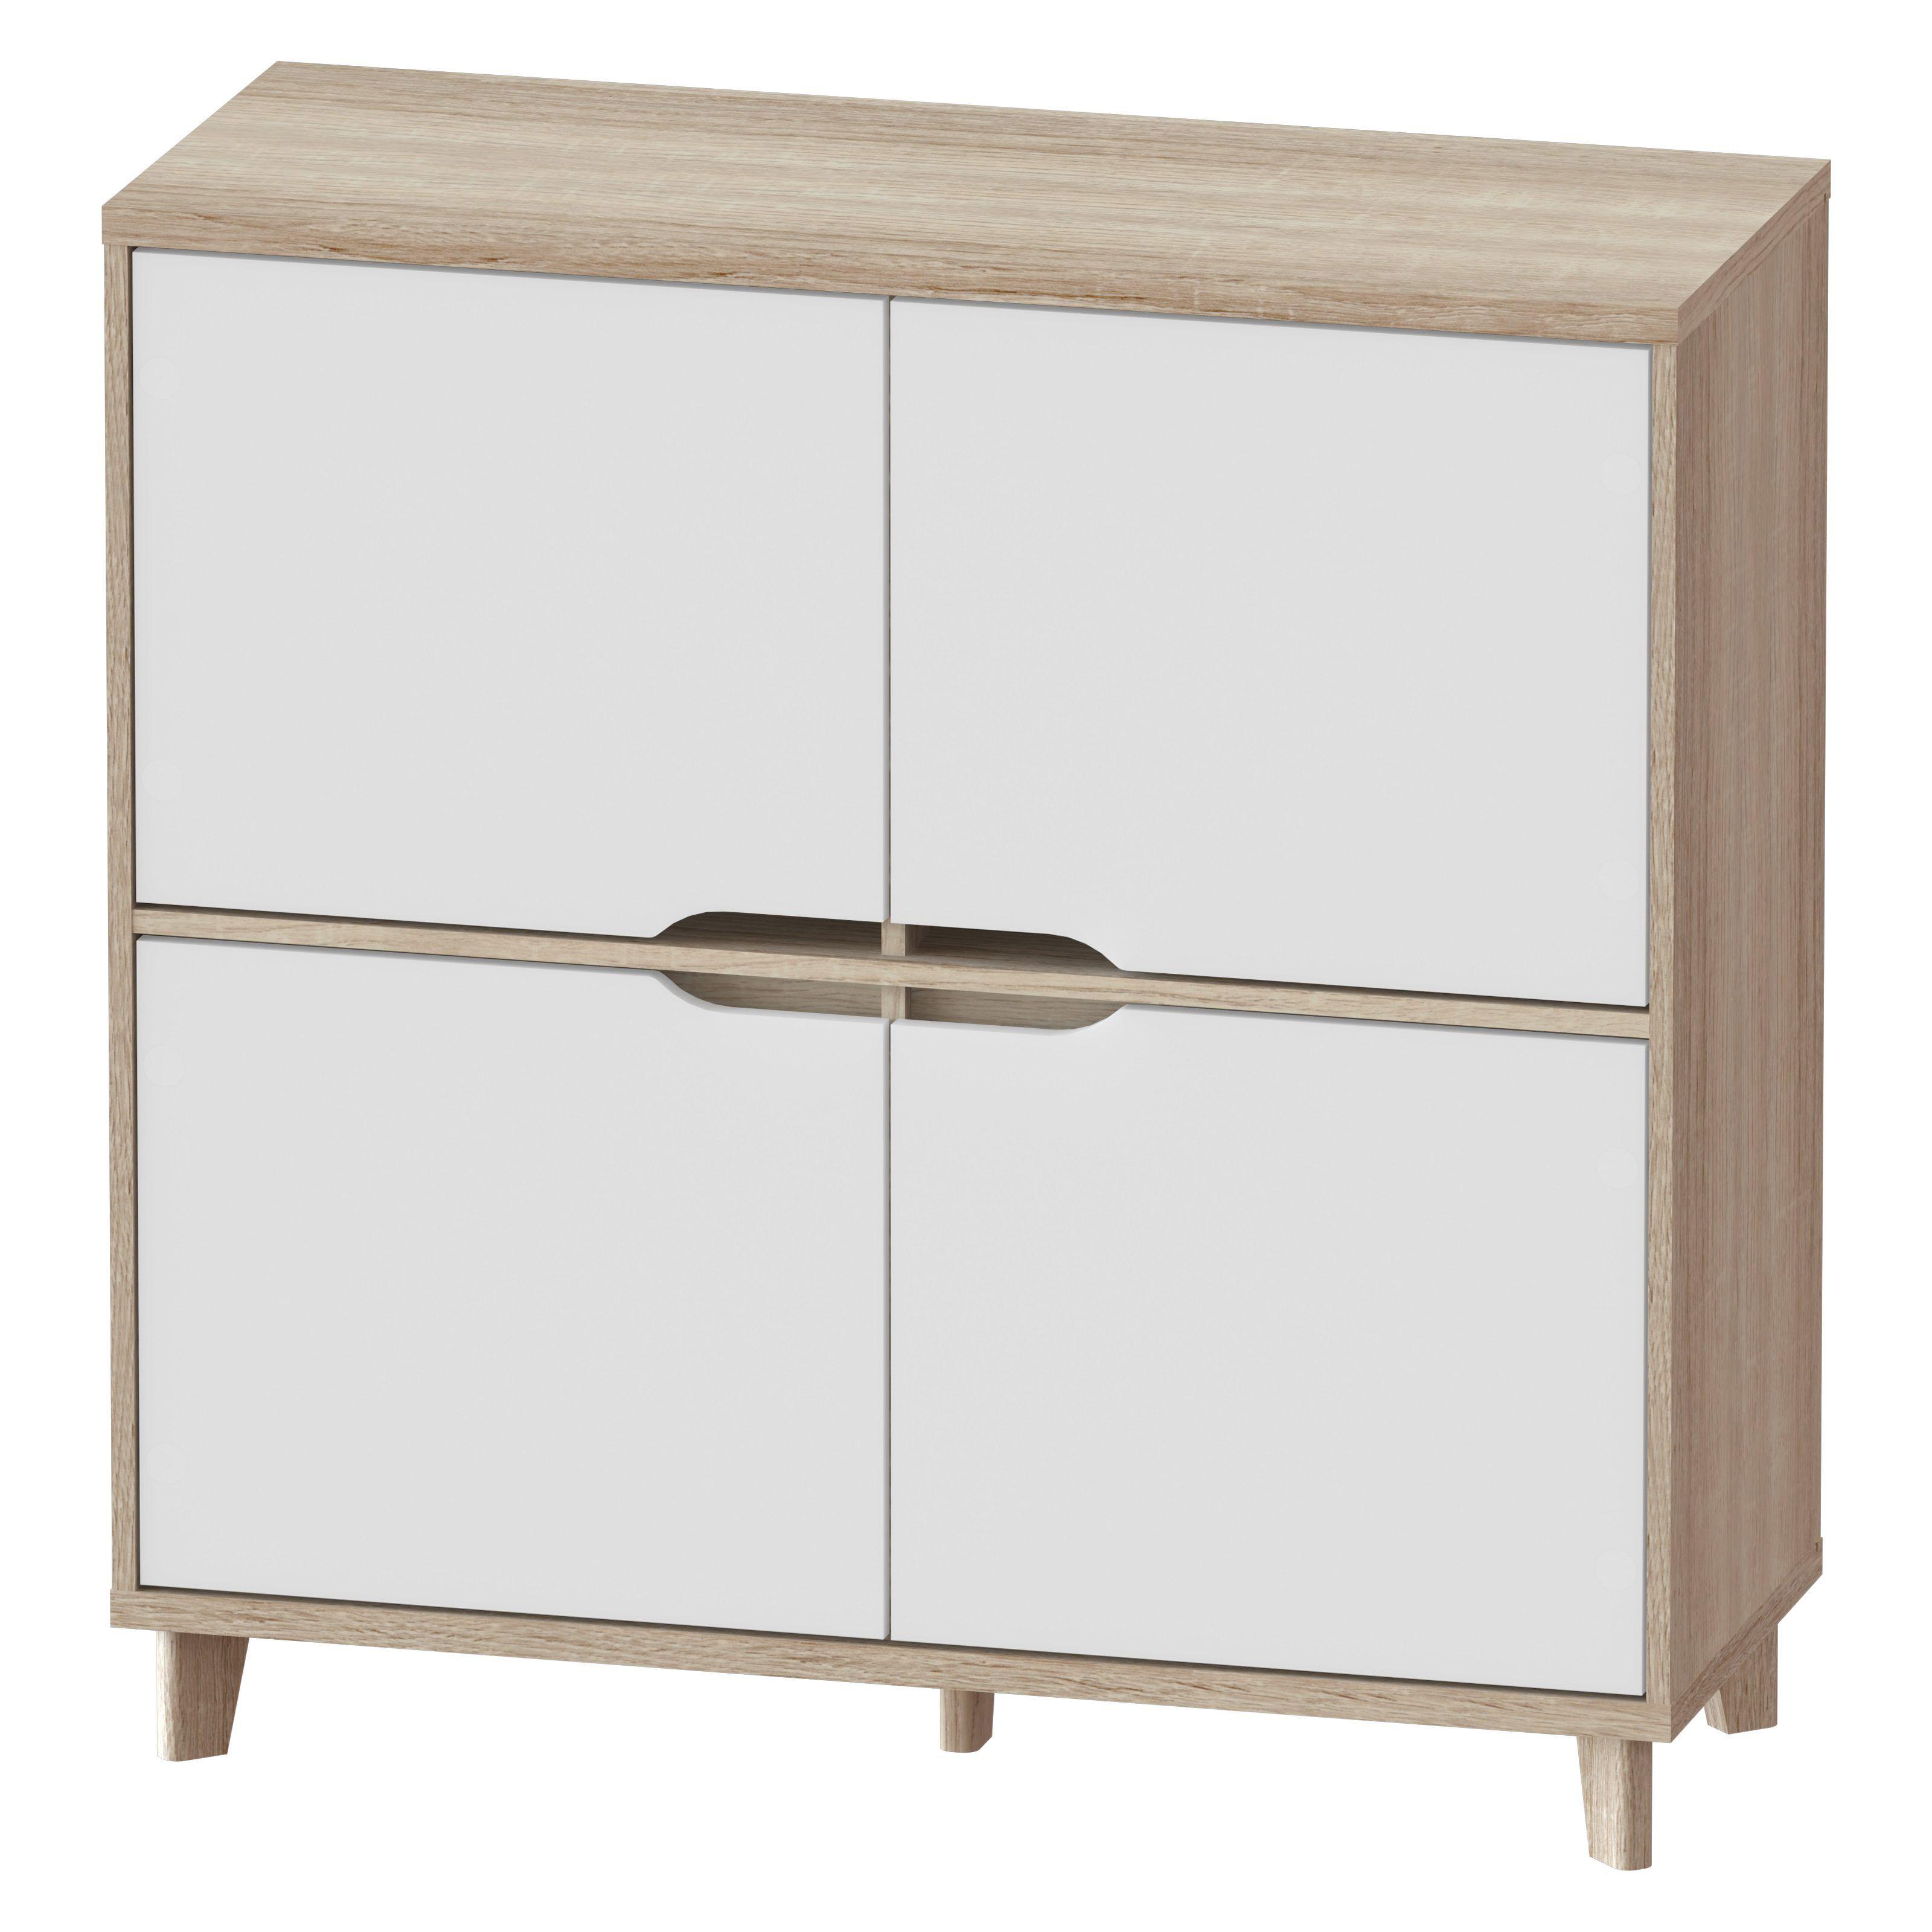 Rangement 4 Portes Nordic Imitation Chene Et Blanc Meuble Rangement Rangement Meuble Chambre